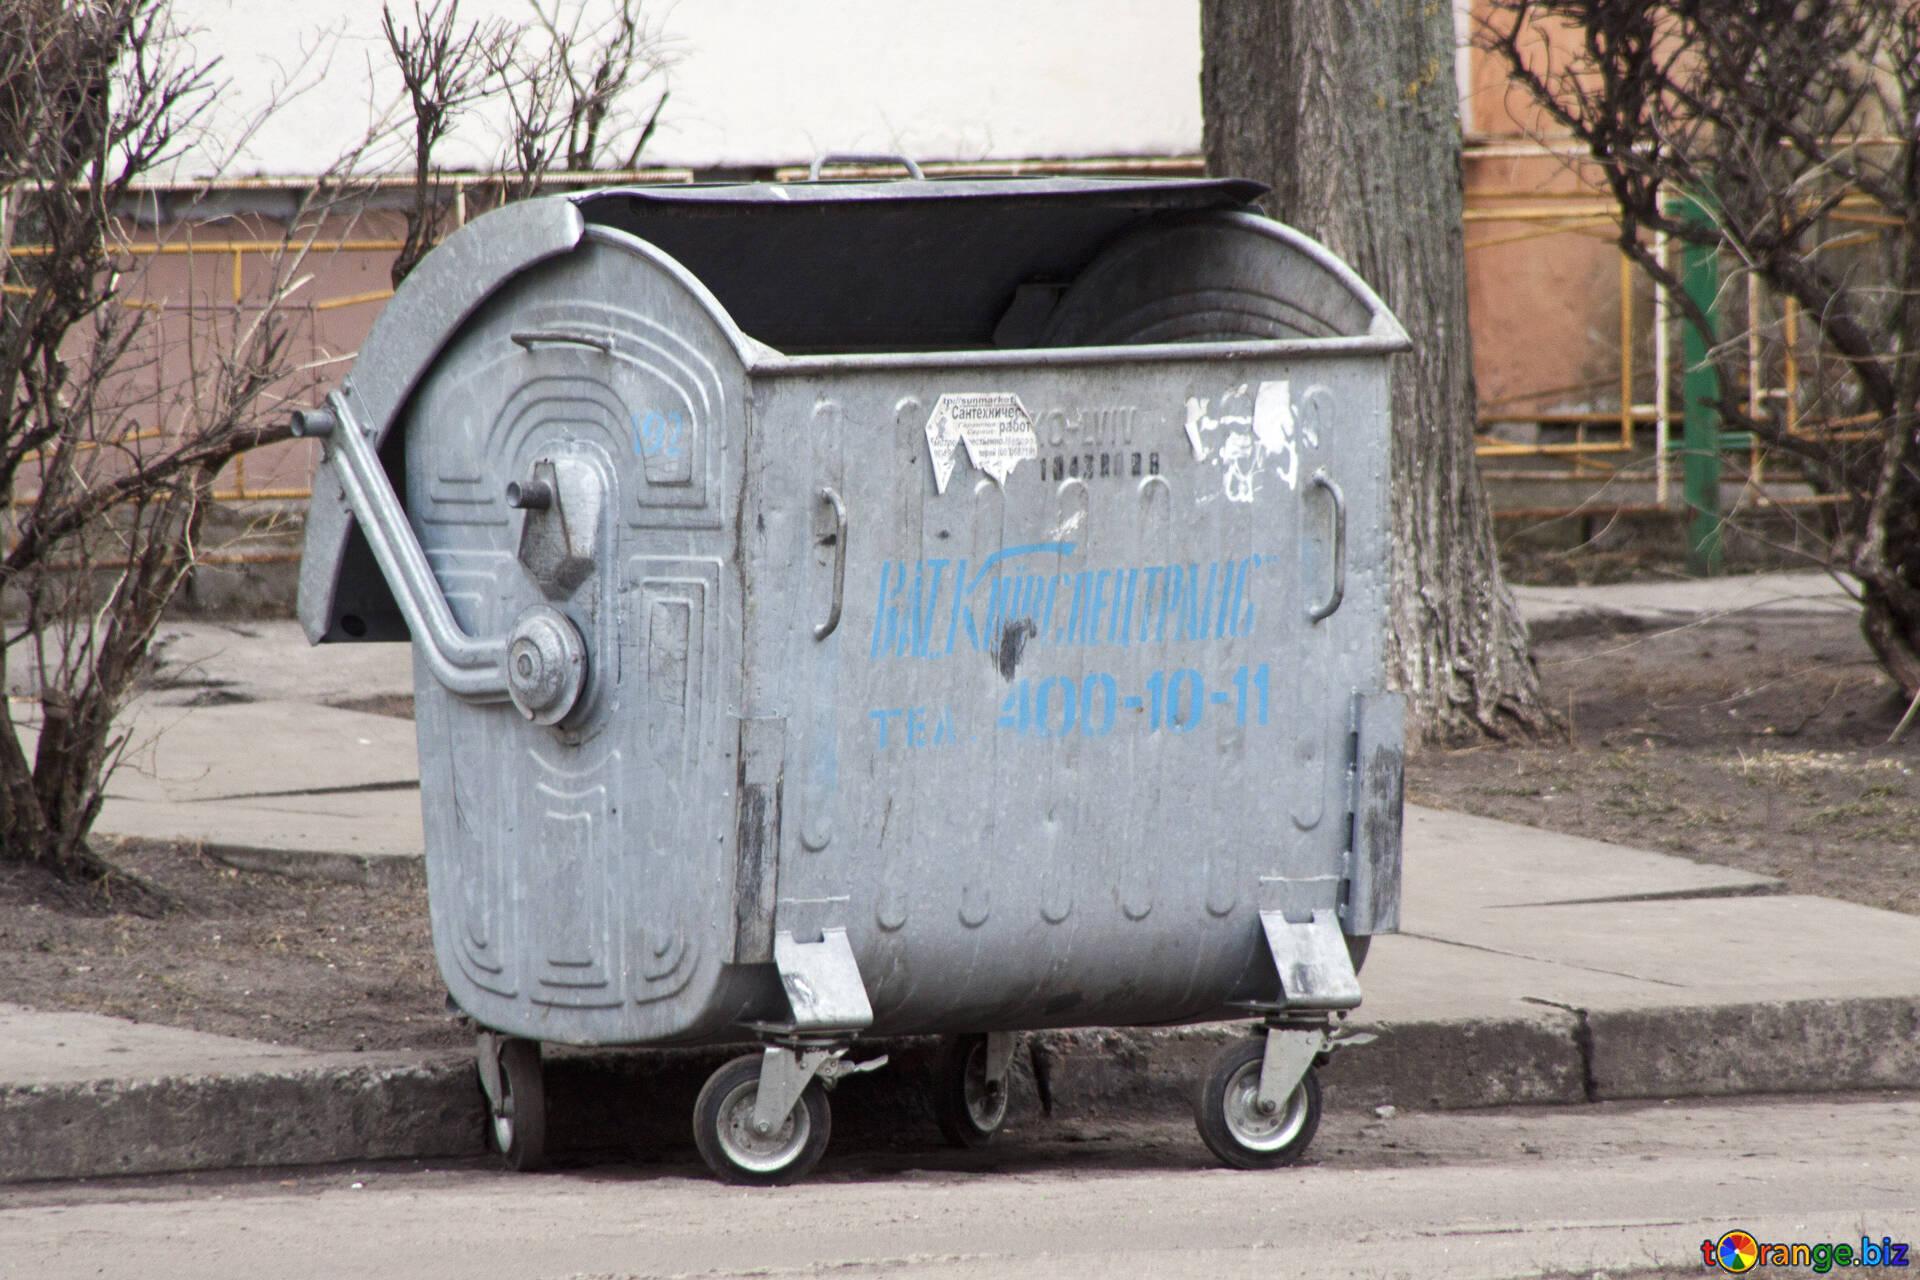 картинка на мусорных баках написано мира добра чары фото